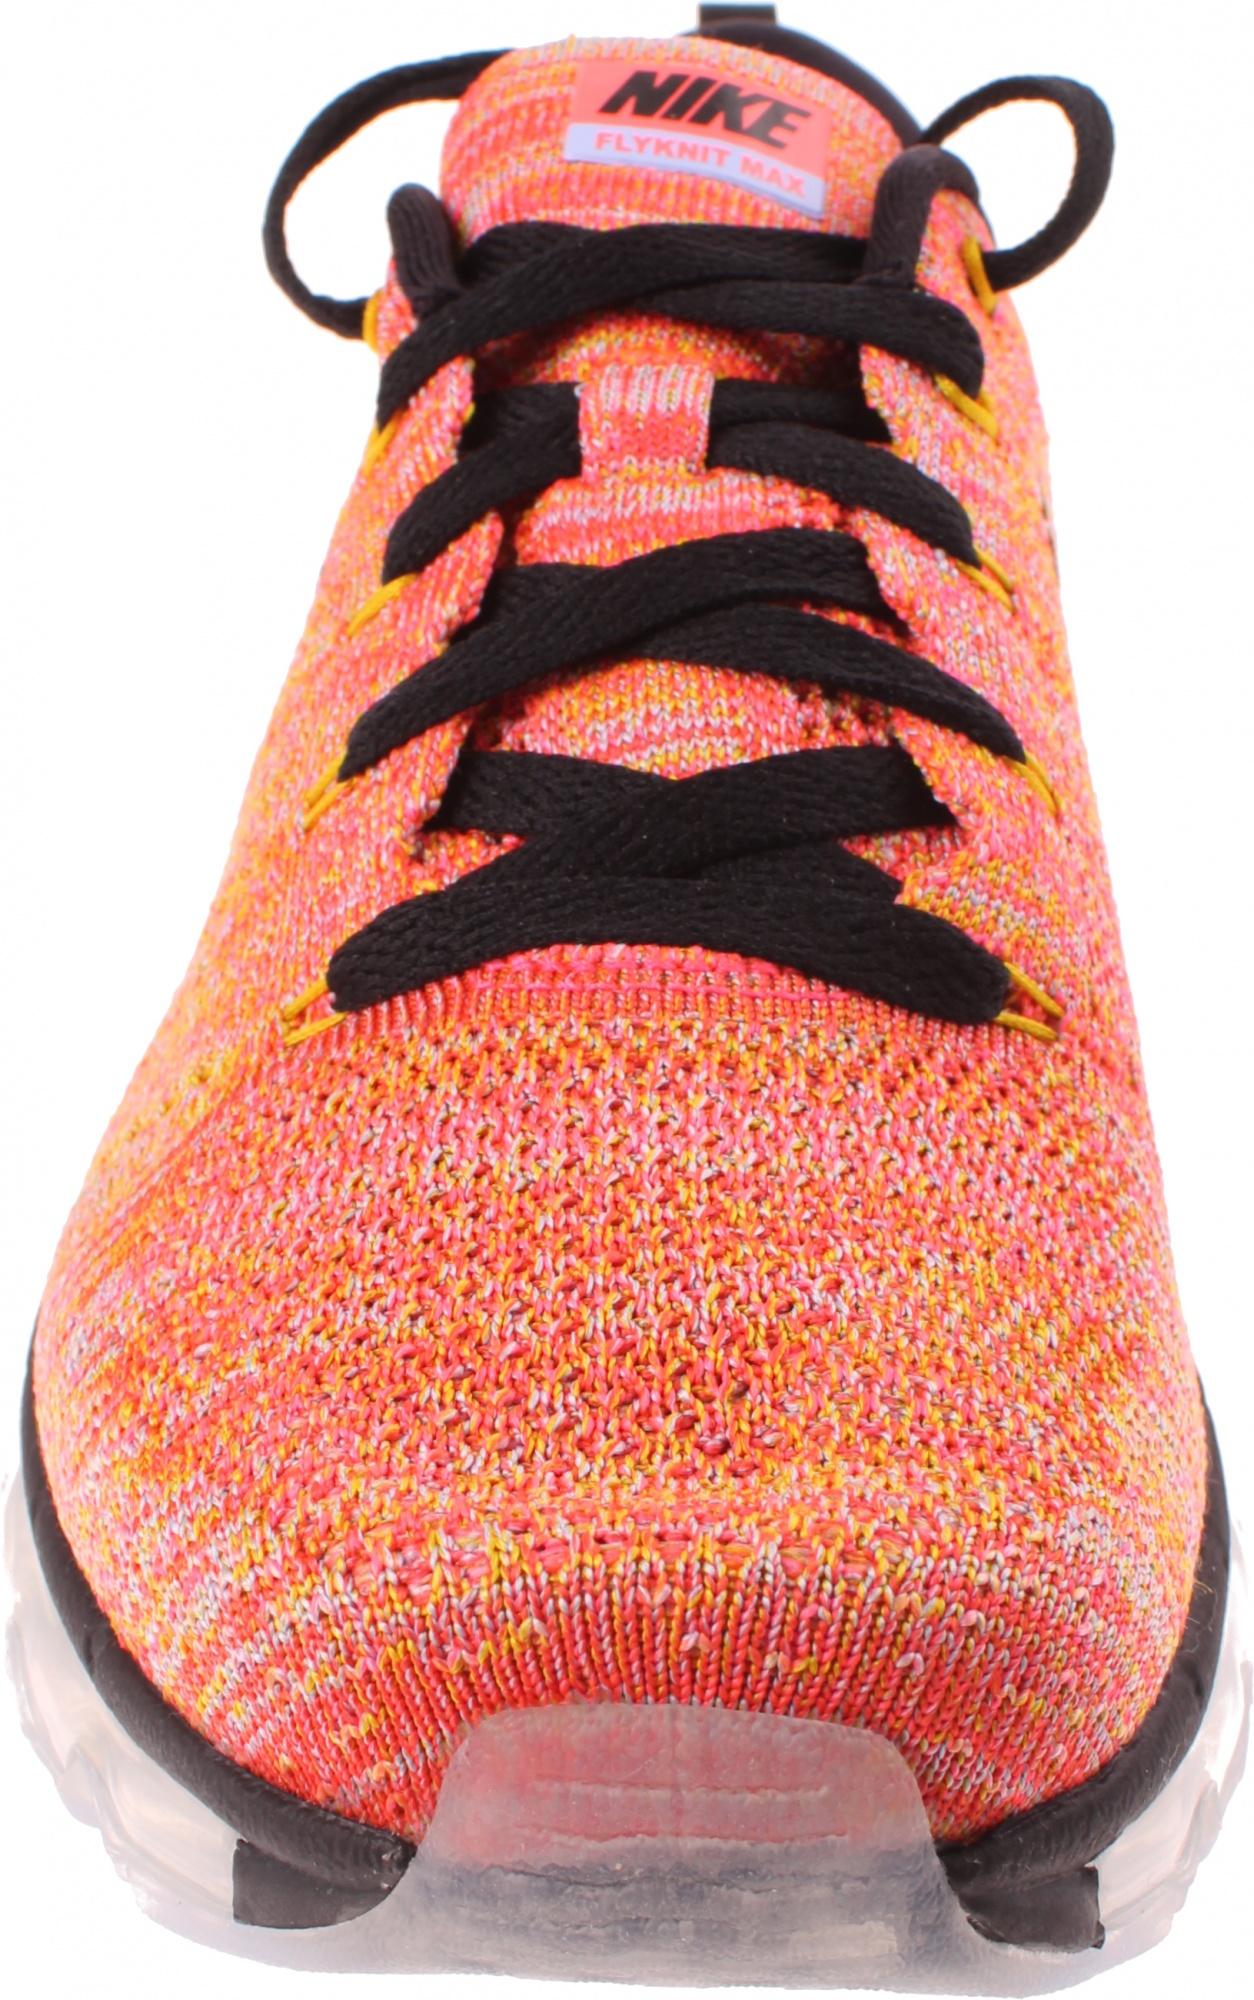 Sneakers Max Sport amp;casuals Flyknit Dames Oranje Nike Internet kiZXPu